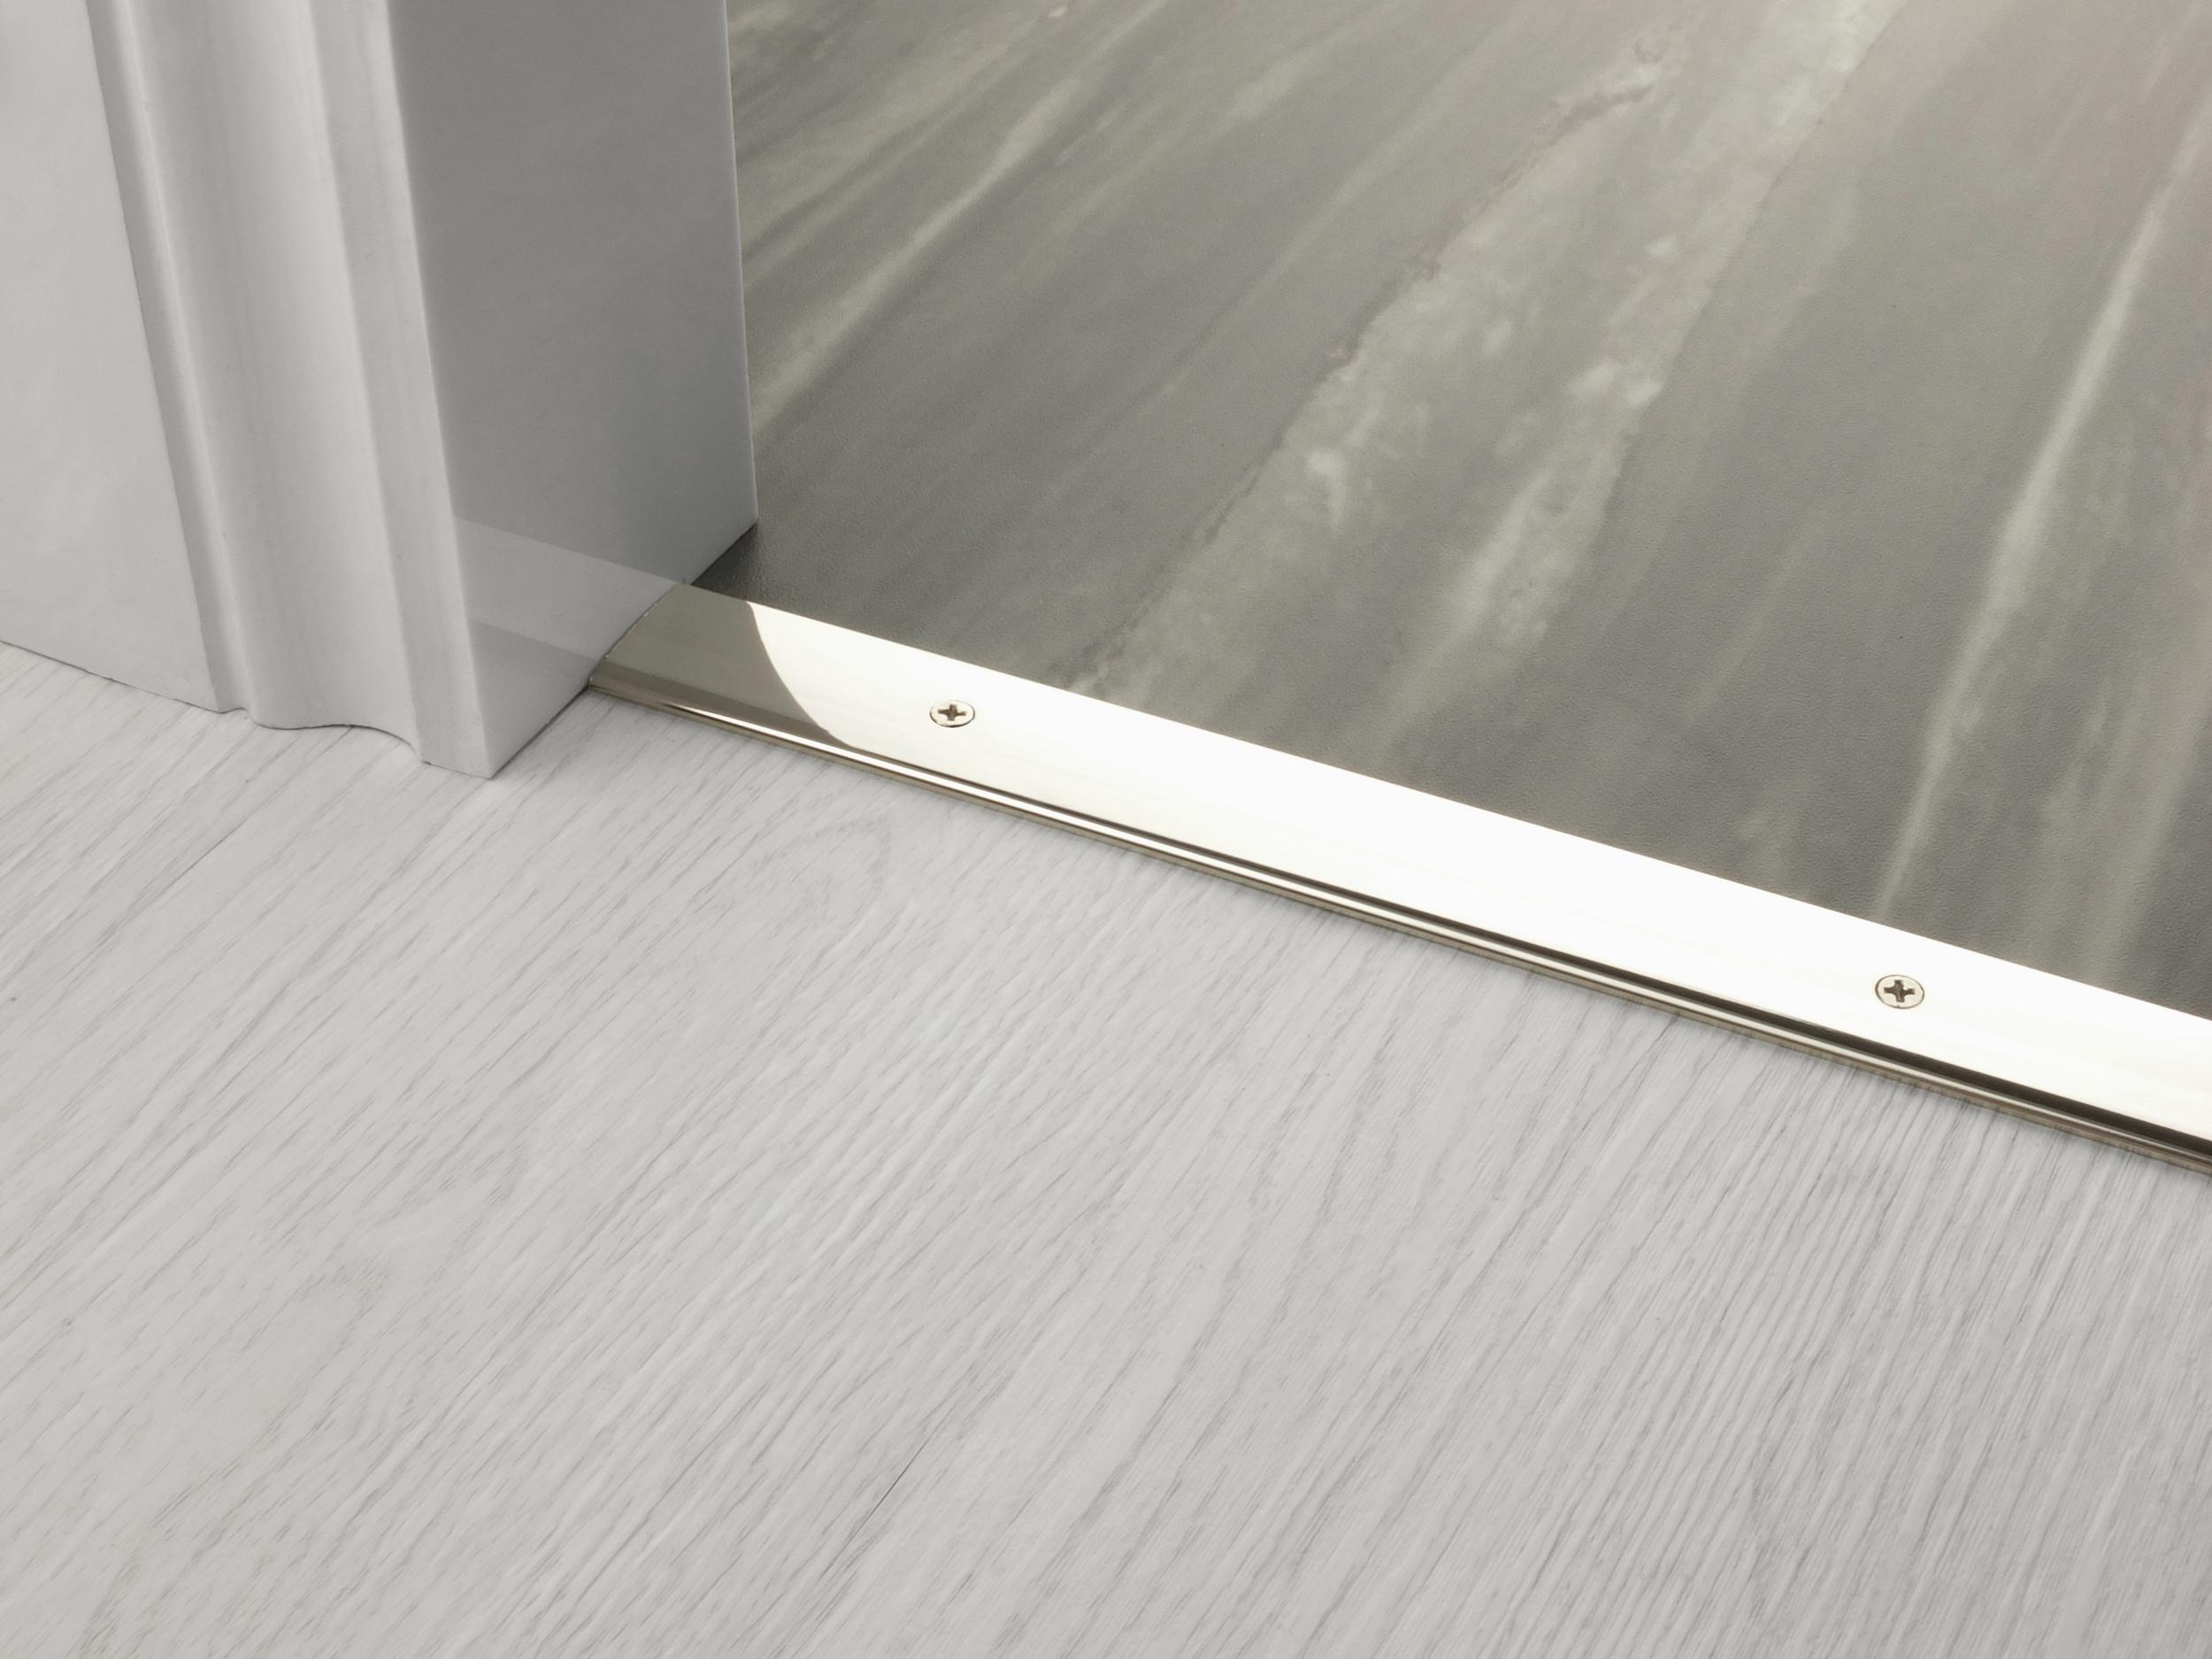 door_bar_cover-30mm_h2h_polished_nickel.jpg